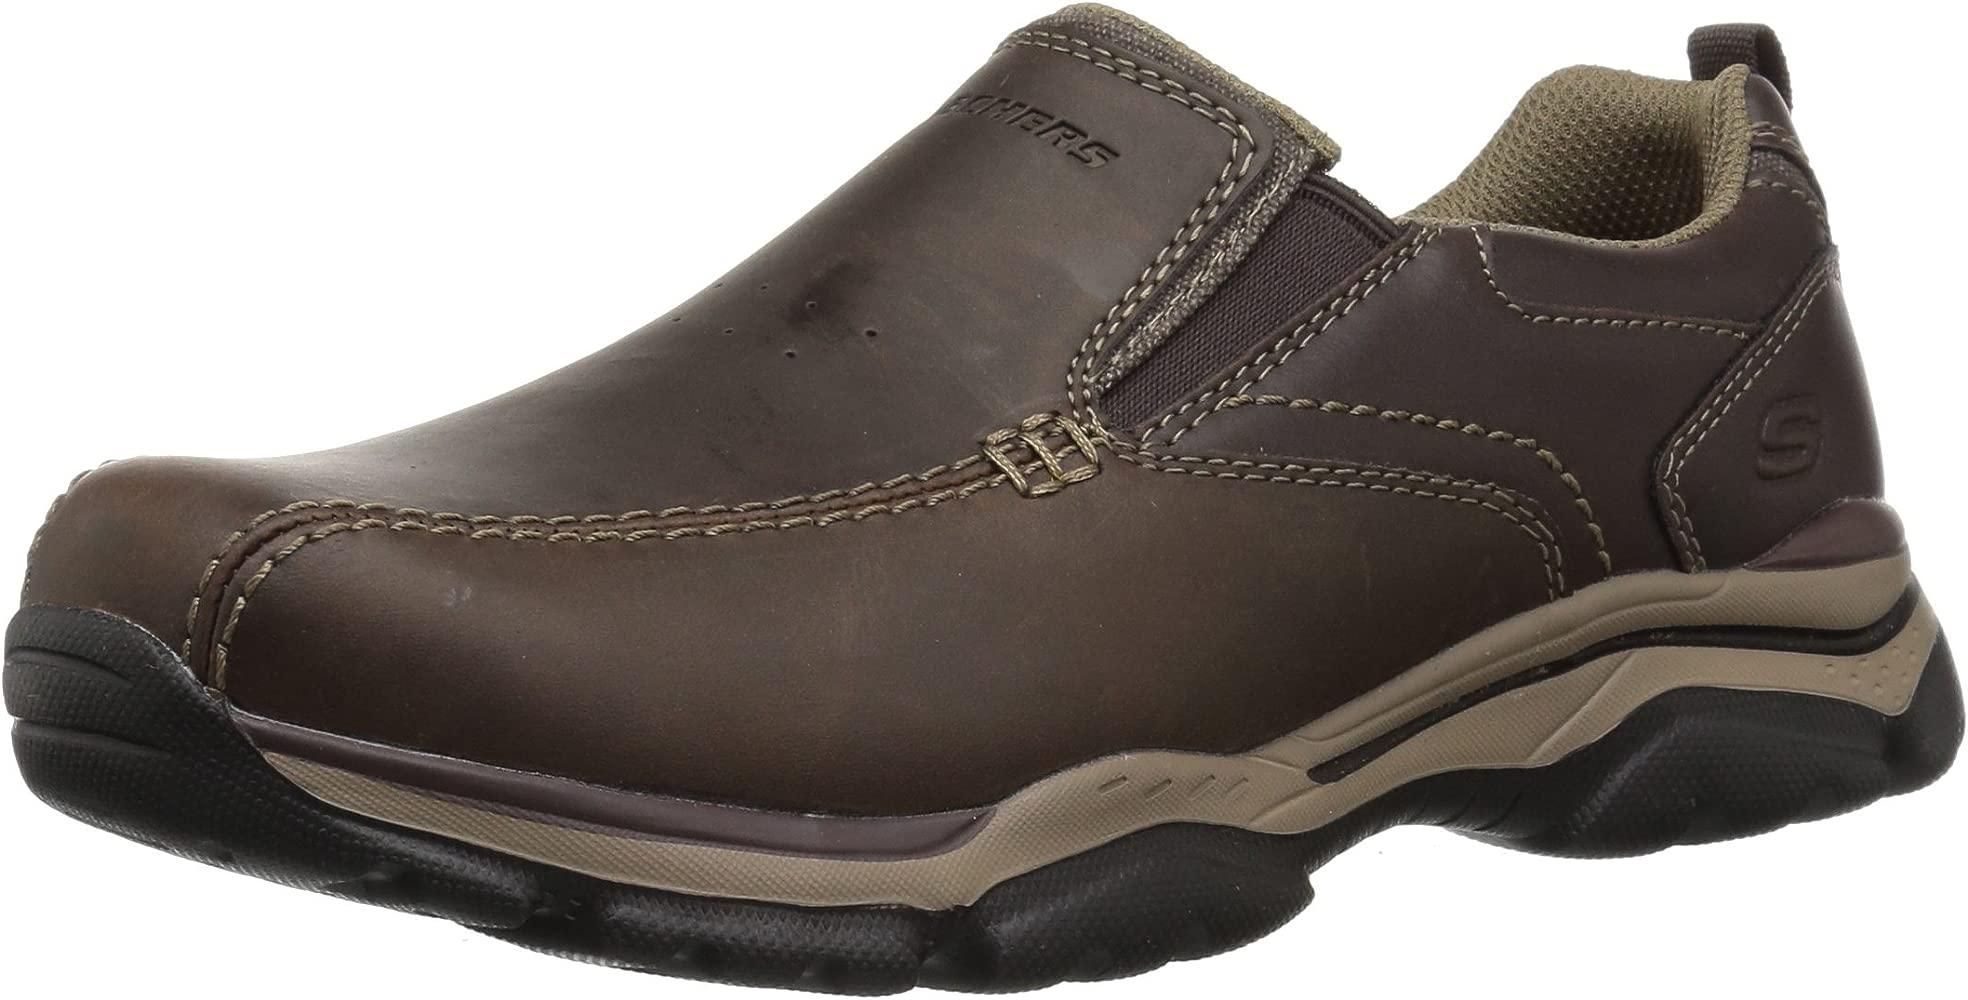 Skechers 65415, Mocasines para Hombre